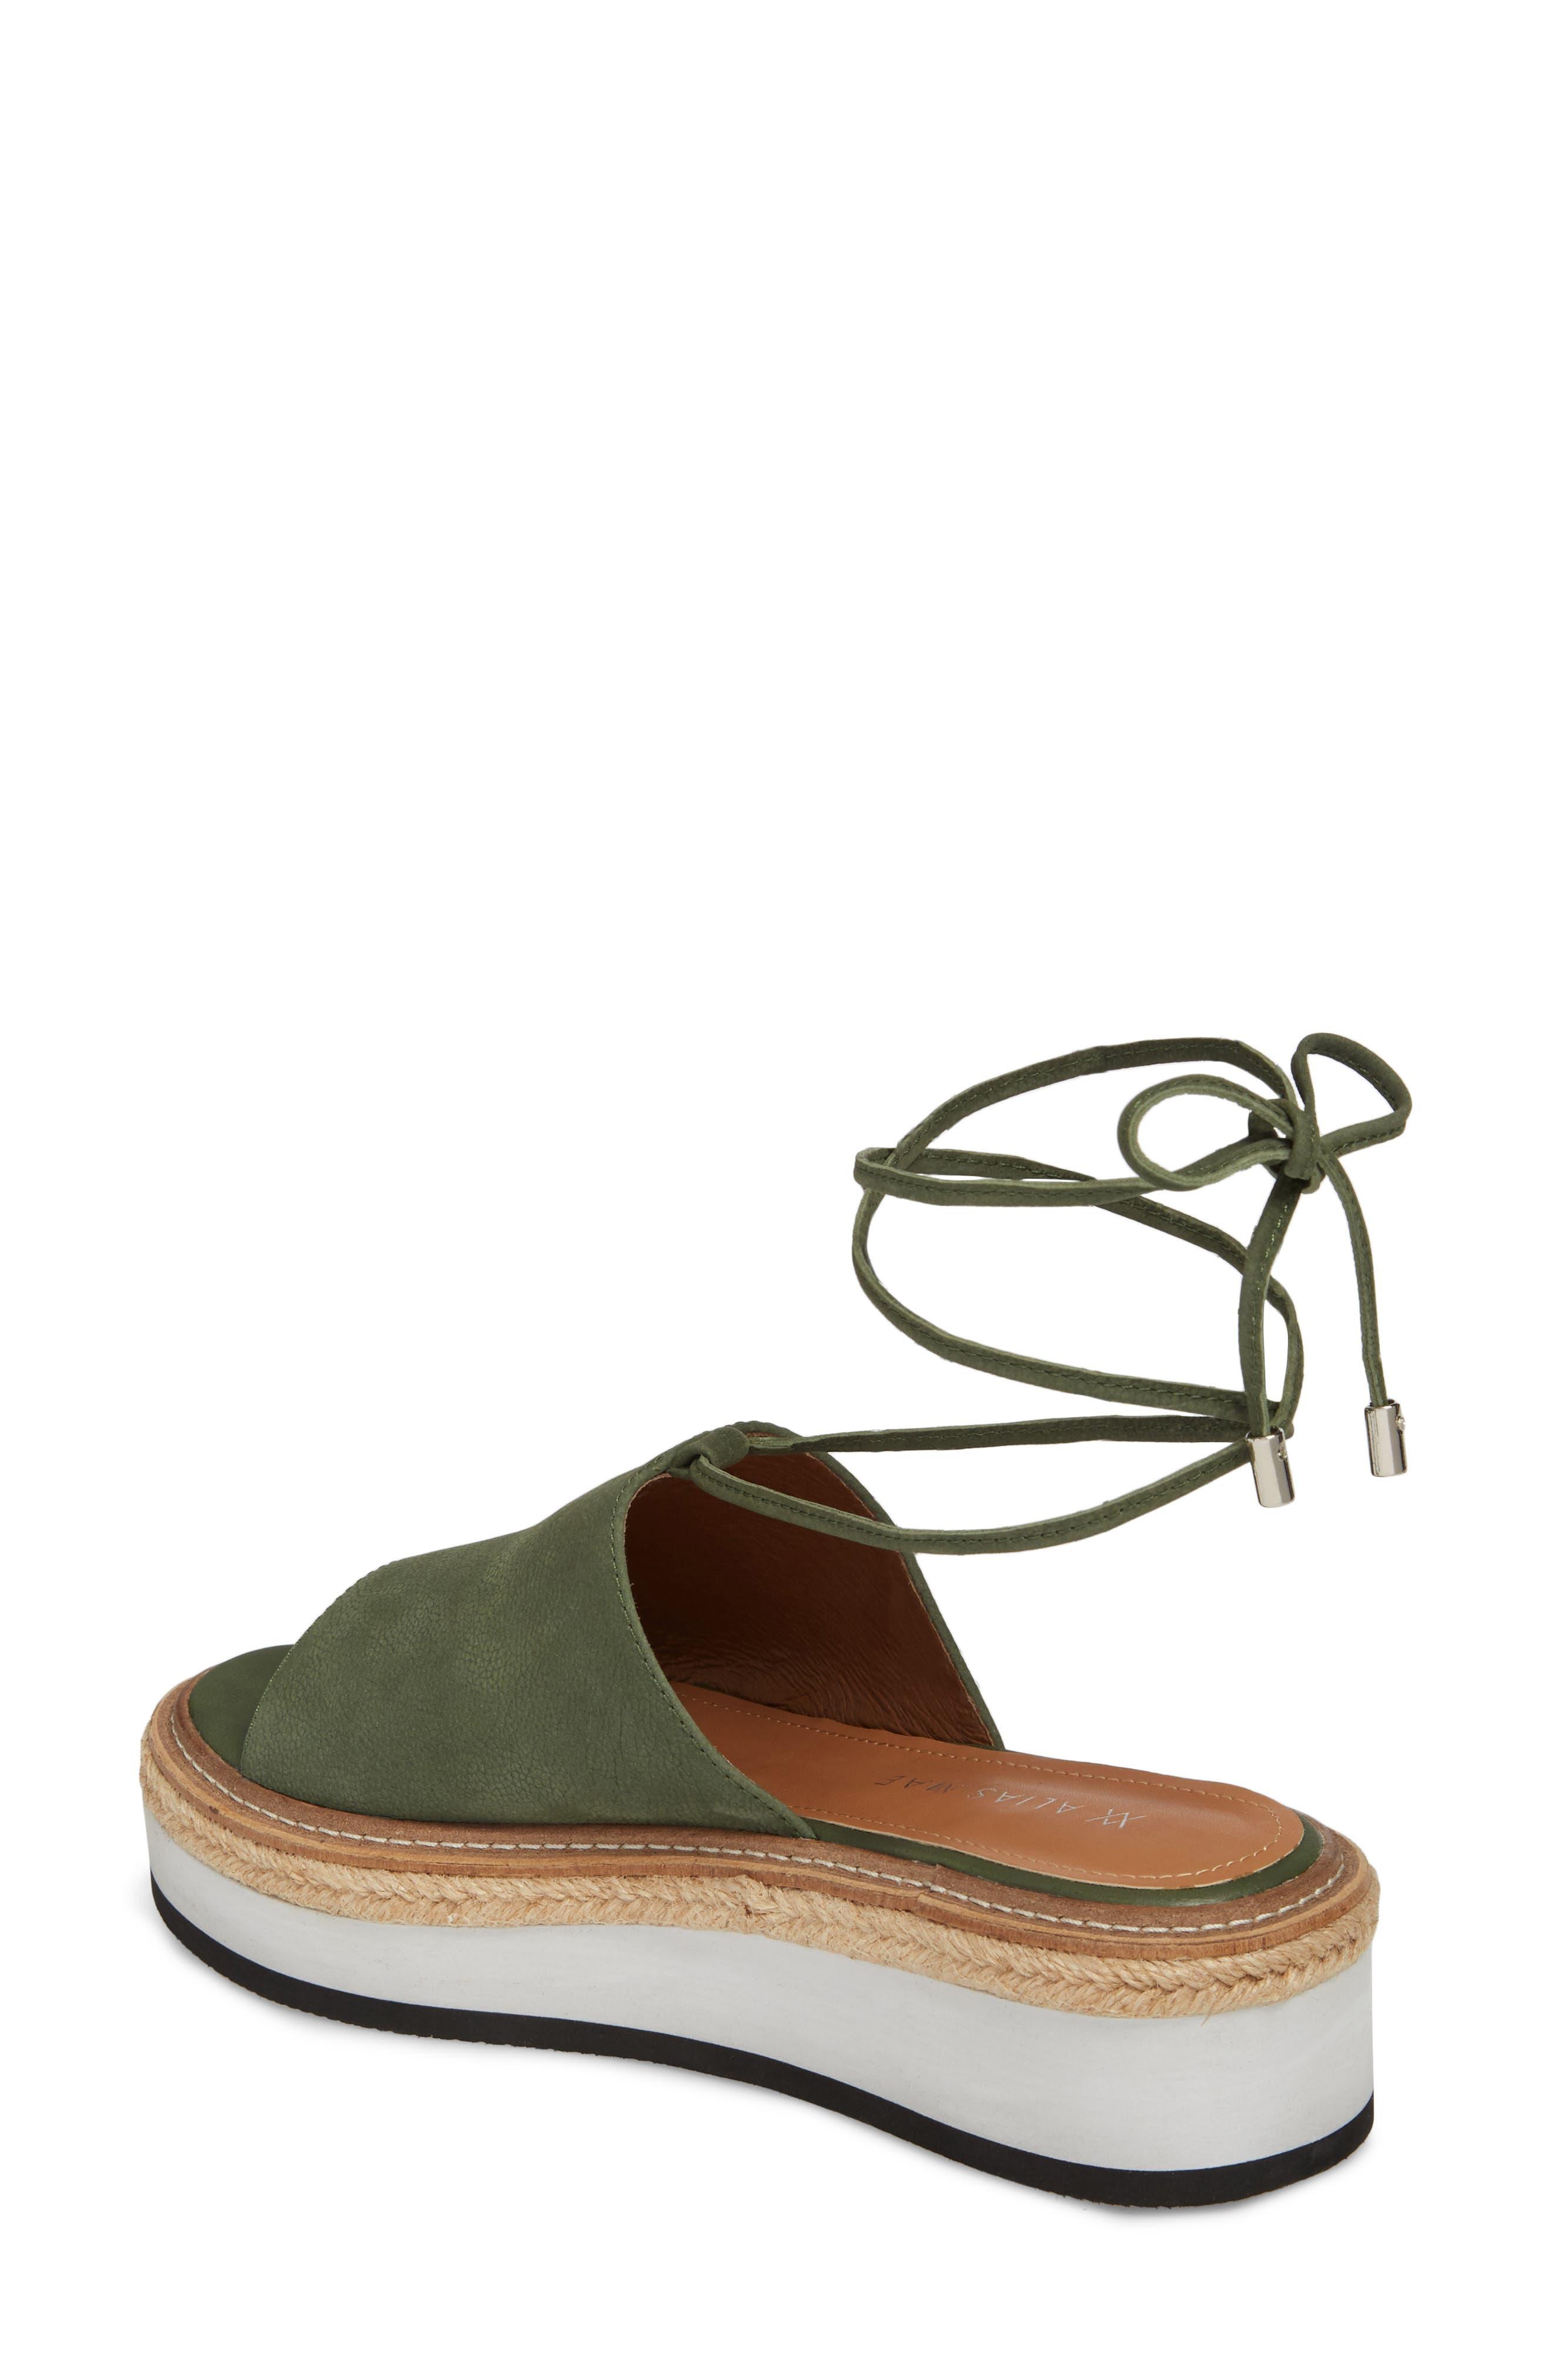 Nickel Platform Sandal,                             Alternate thumbnail 2, color,                             Khaki Nubuck Leather